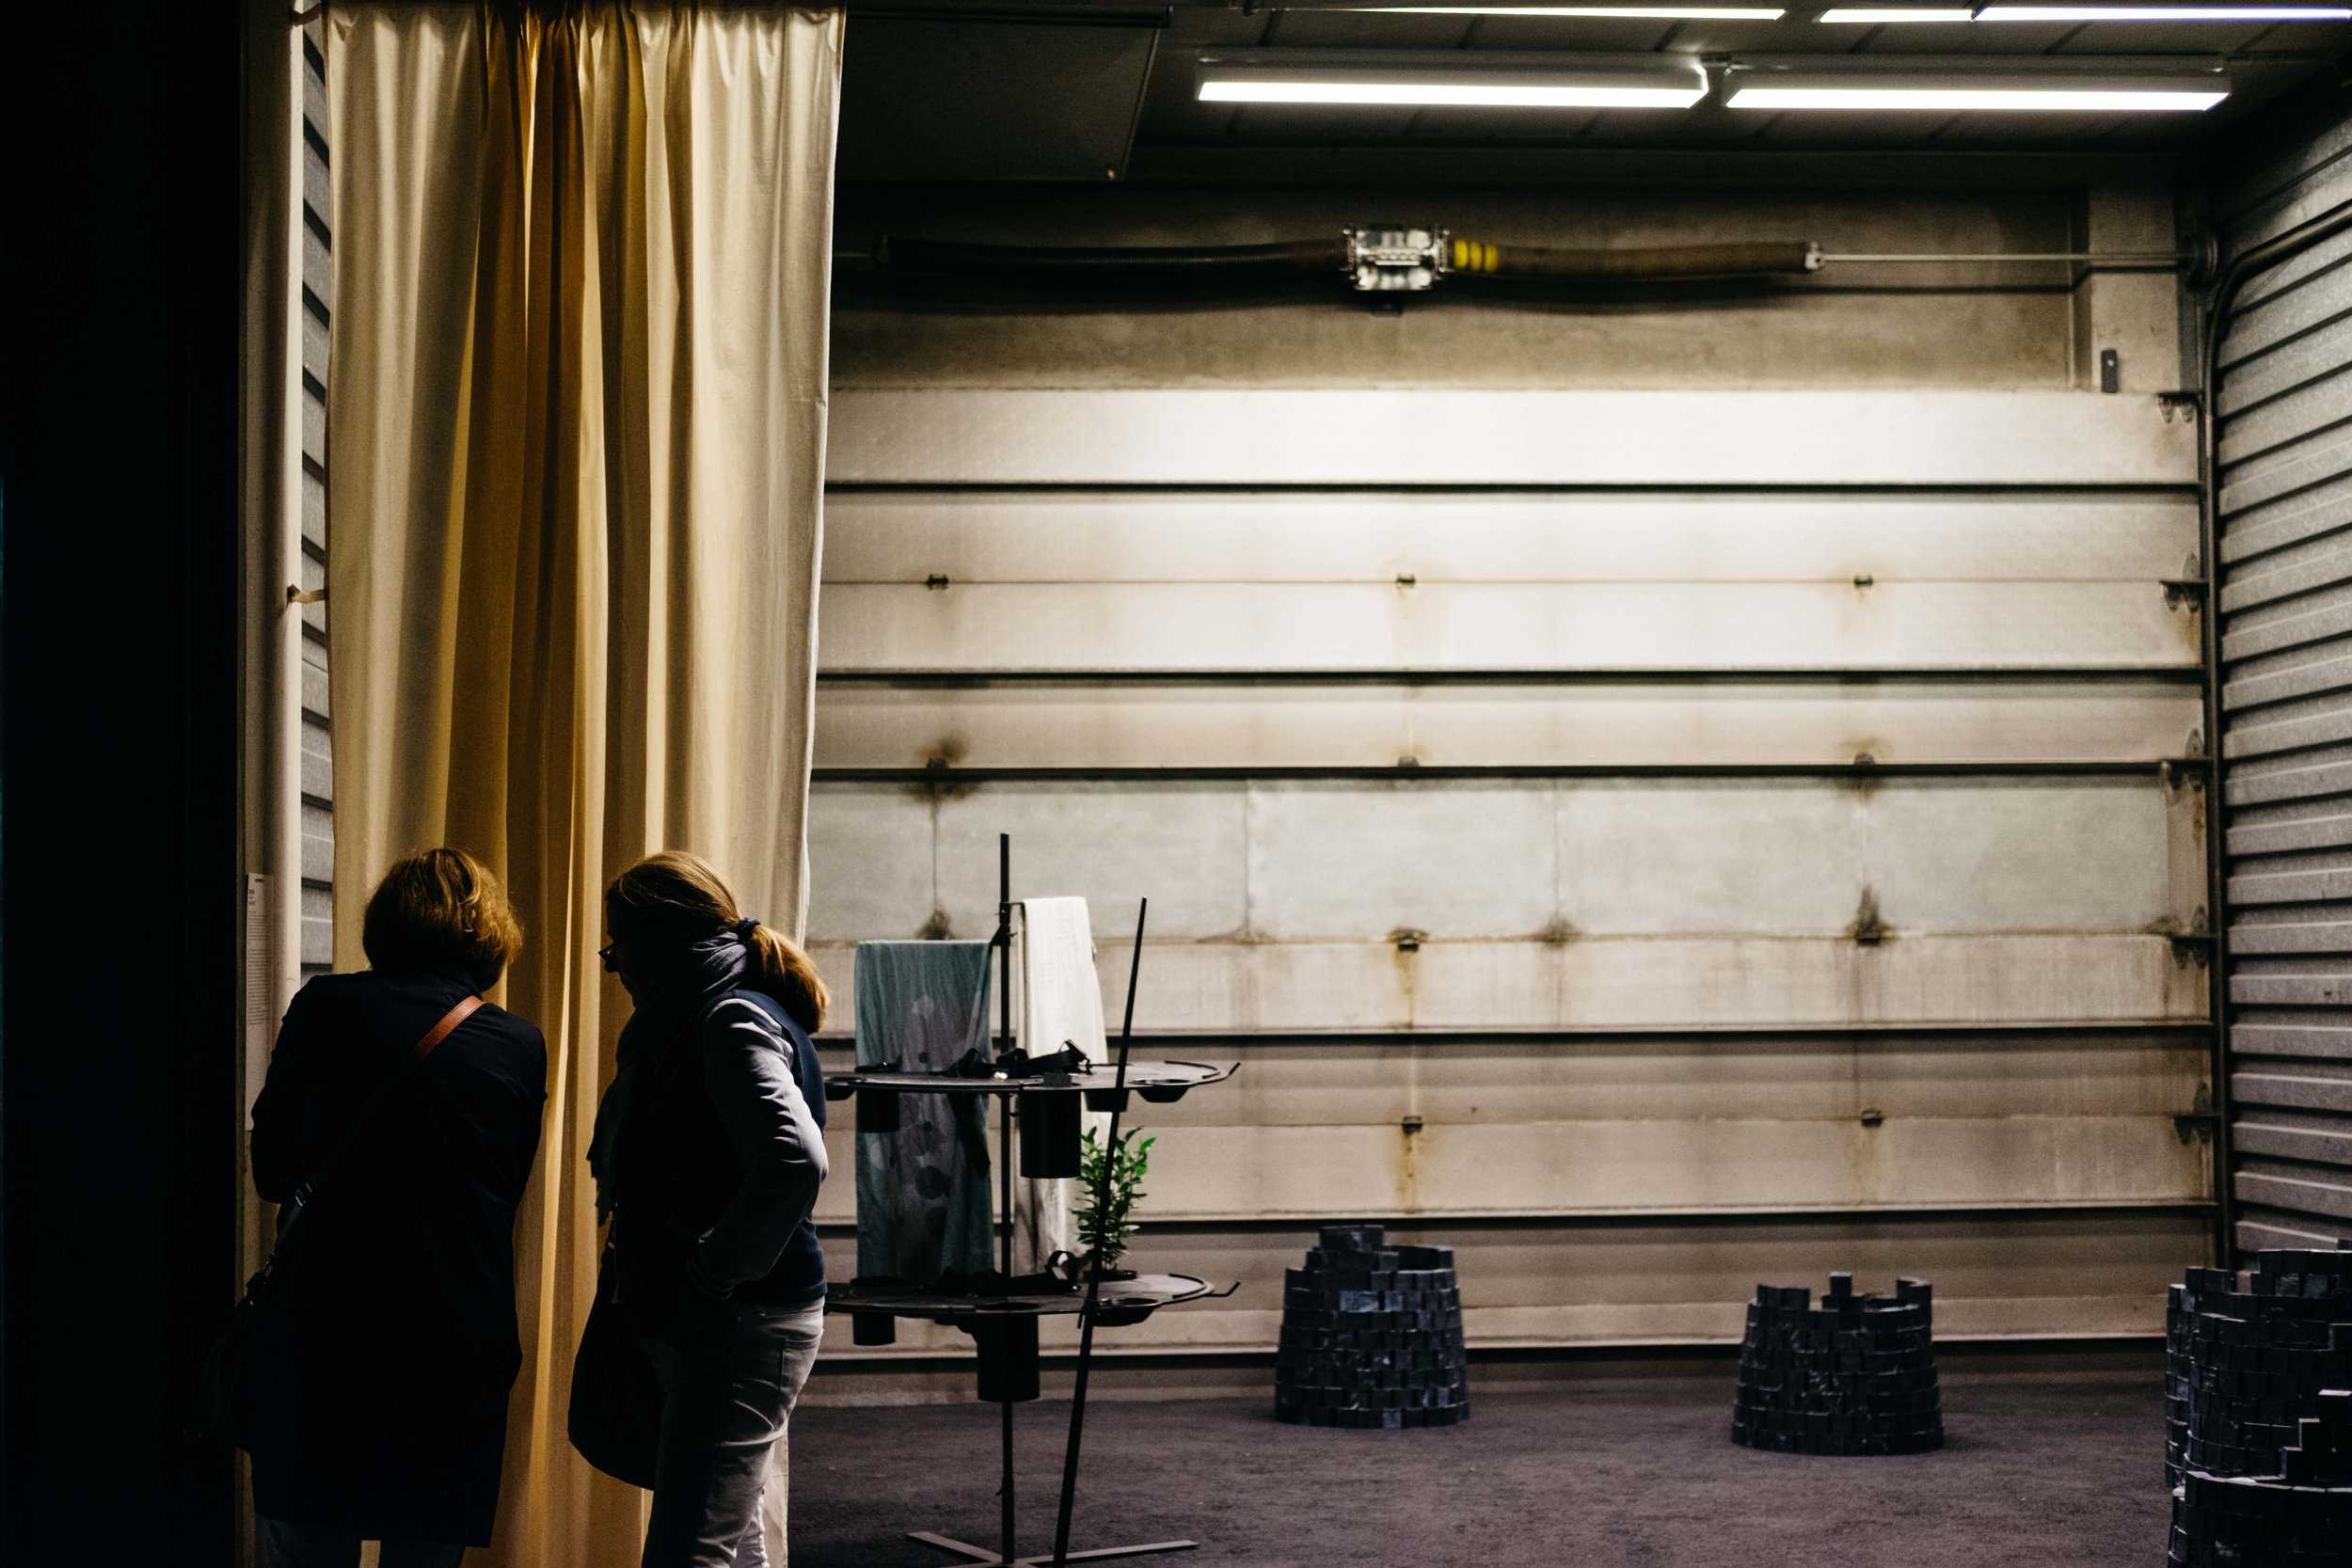 documenta14-kassel-kunst-wearecity-simonhariman-2017-22.jpg